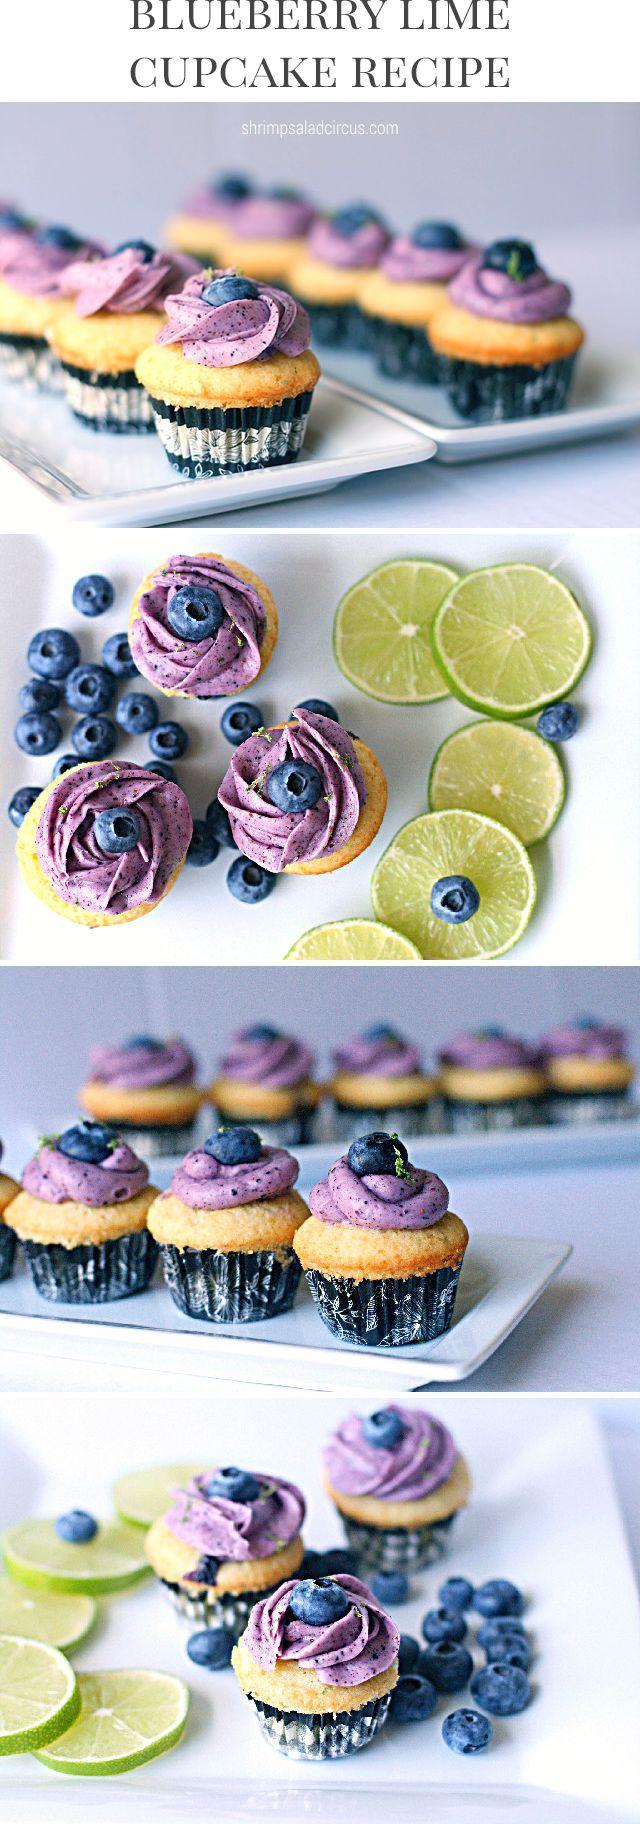 Blueberry Lime Cupcakes Recipe - Shrimp Salad Circus